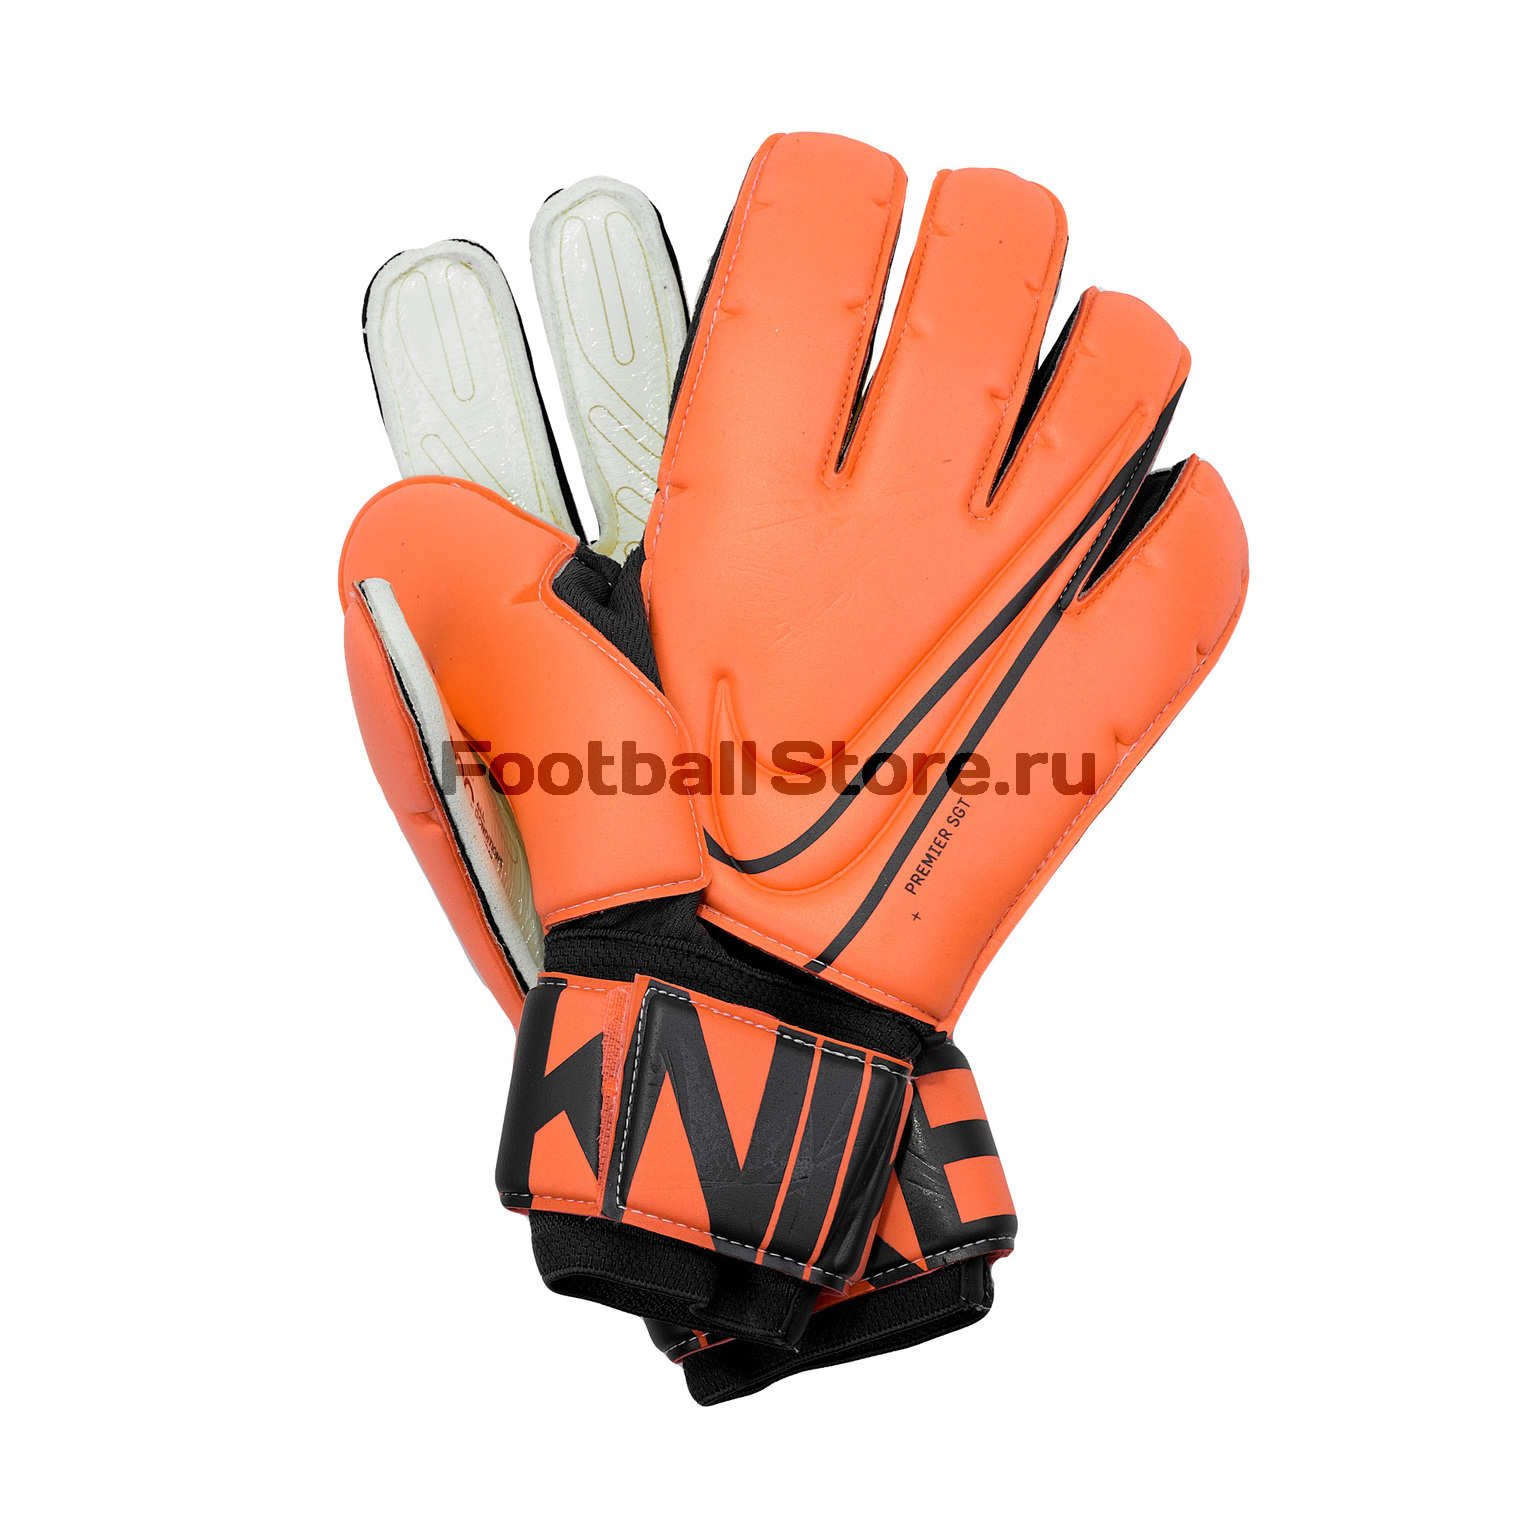 цена на Перчатки вратарские Nike Premier GS0387-892